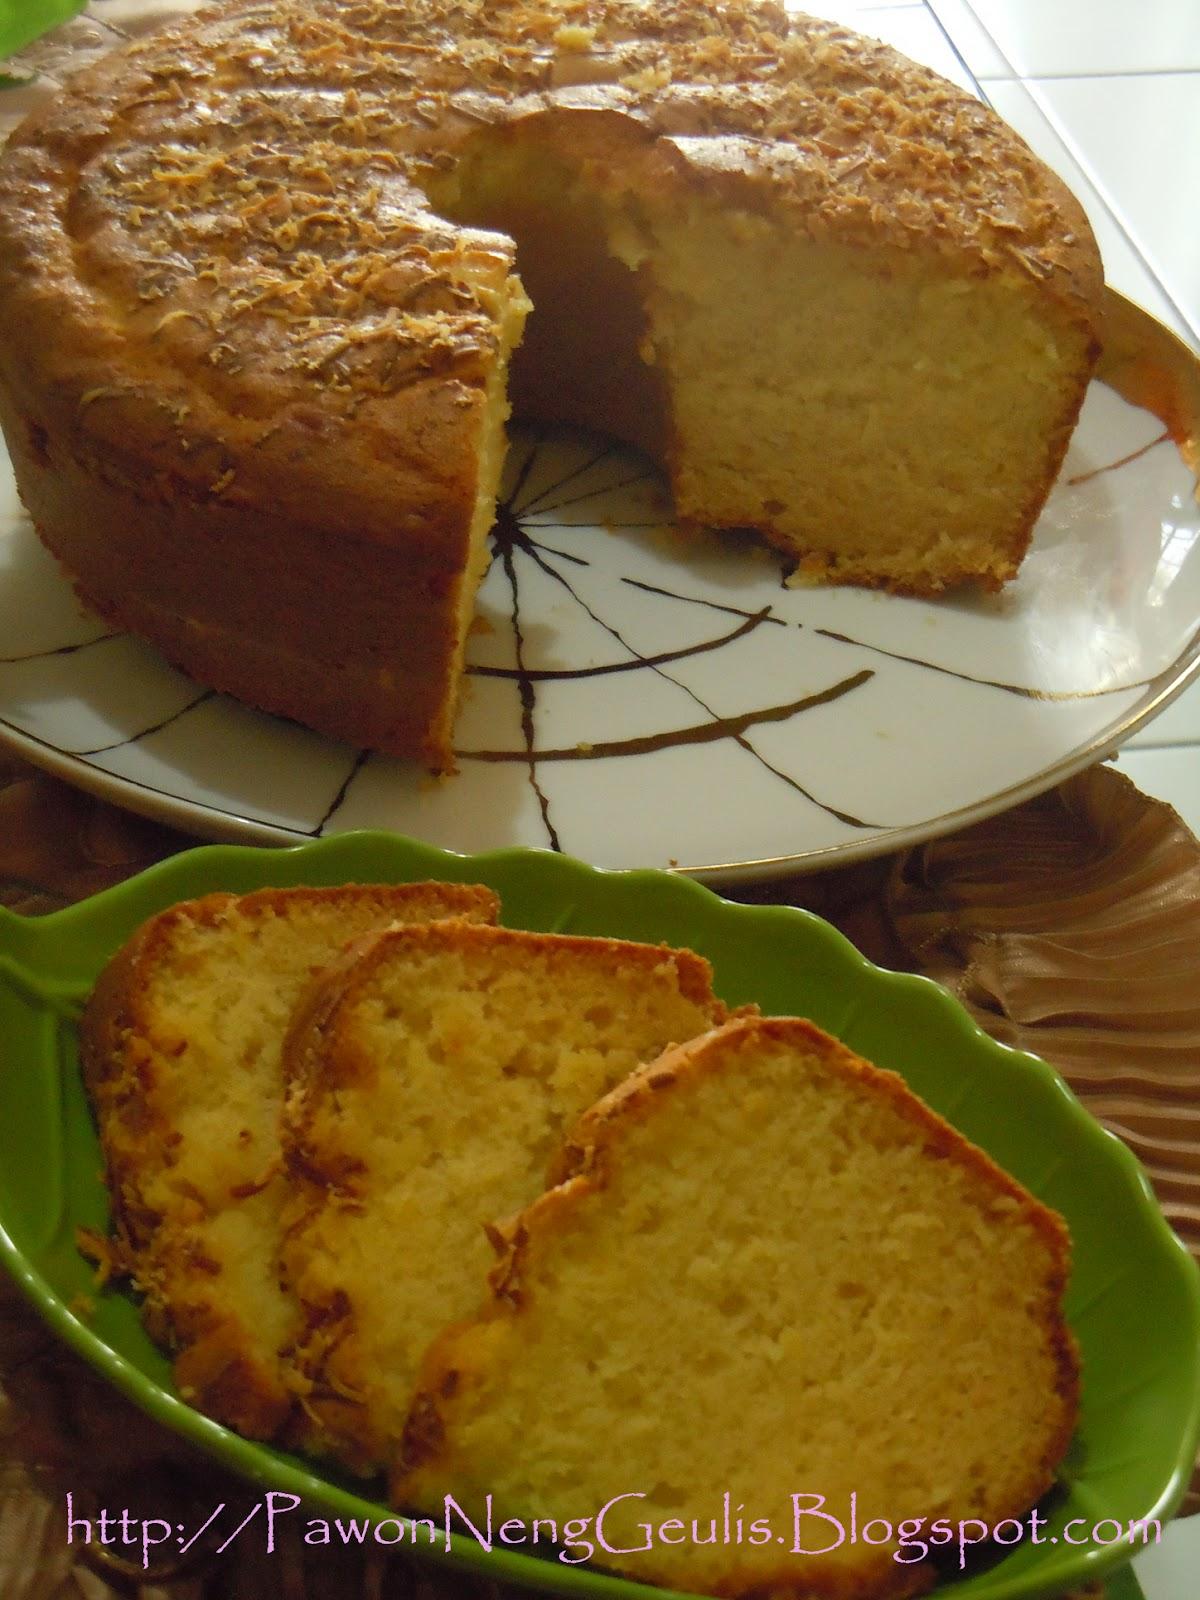 resep cake bolu gulung ekonomis bolu gulung keju ala ordinary kitchen ...